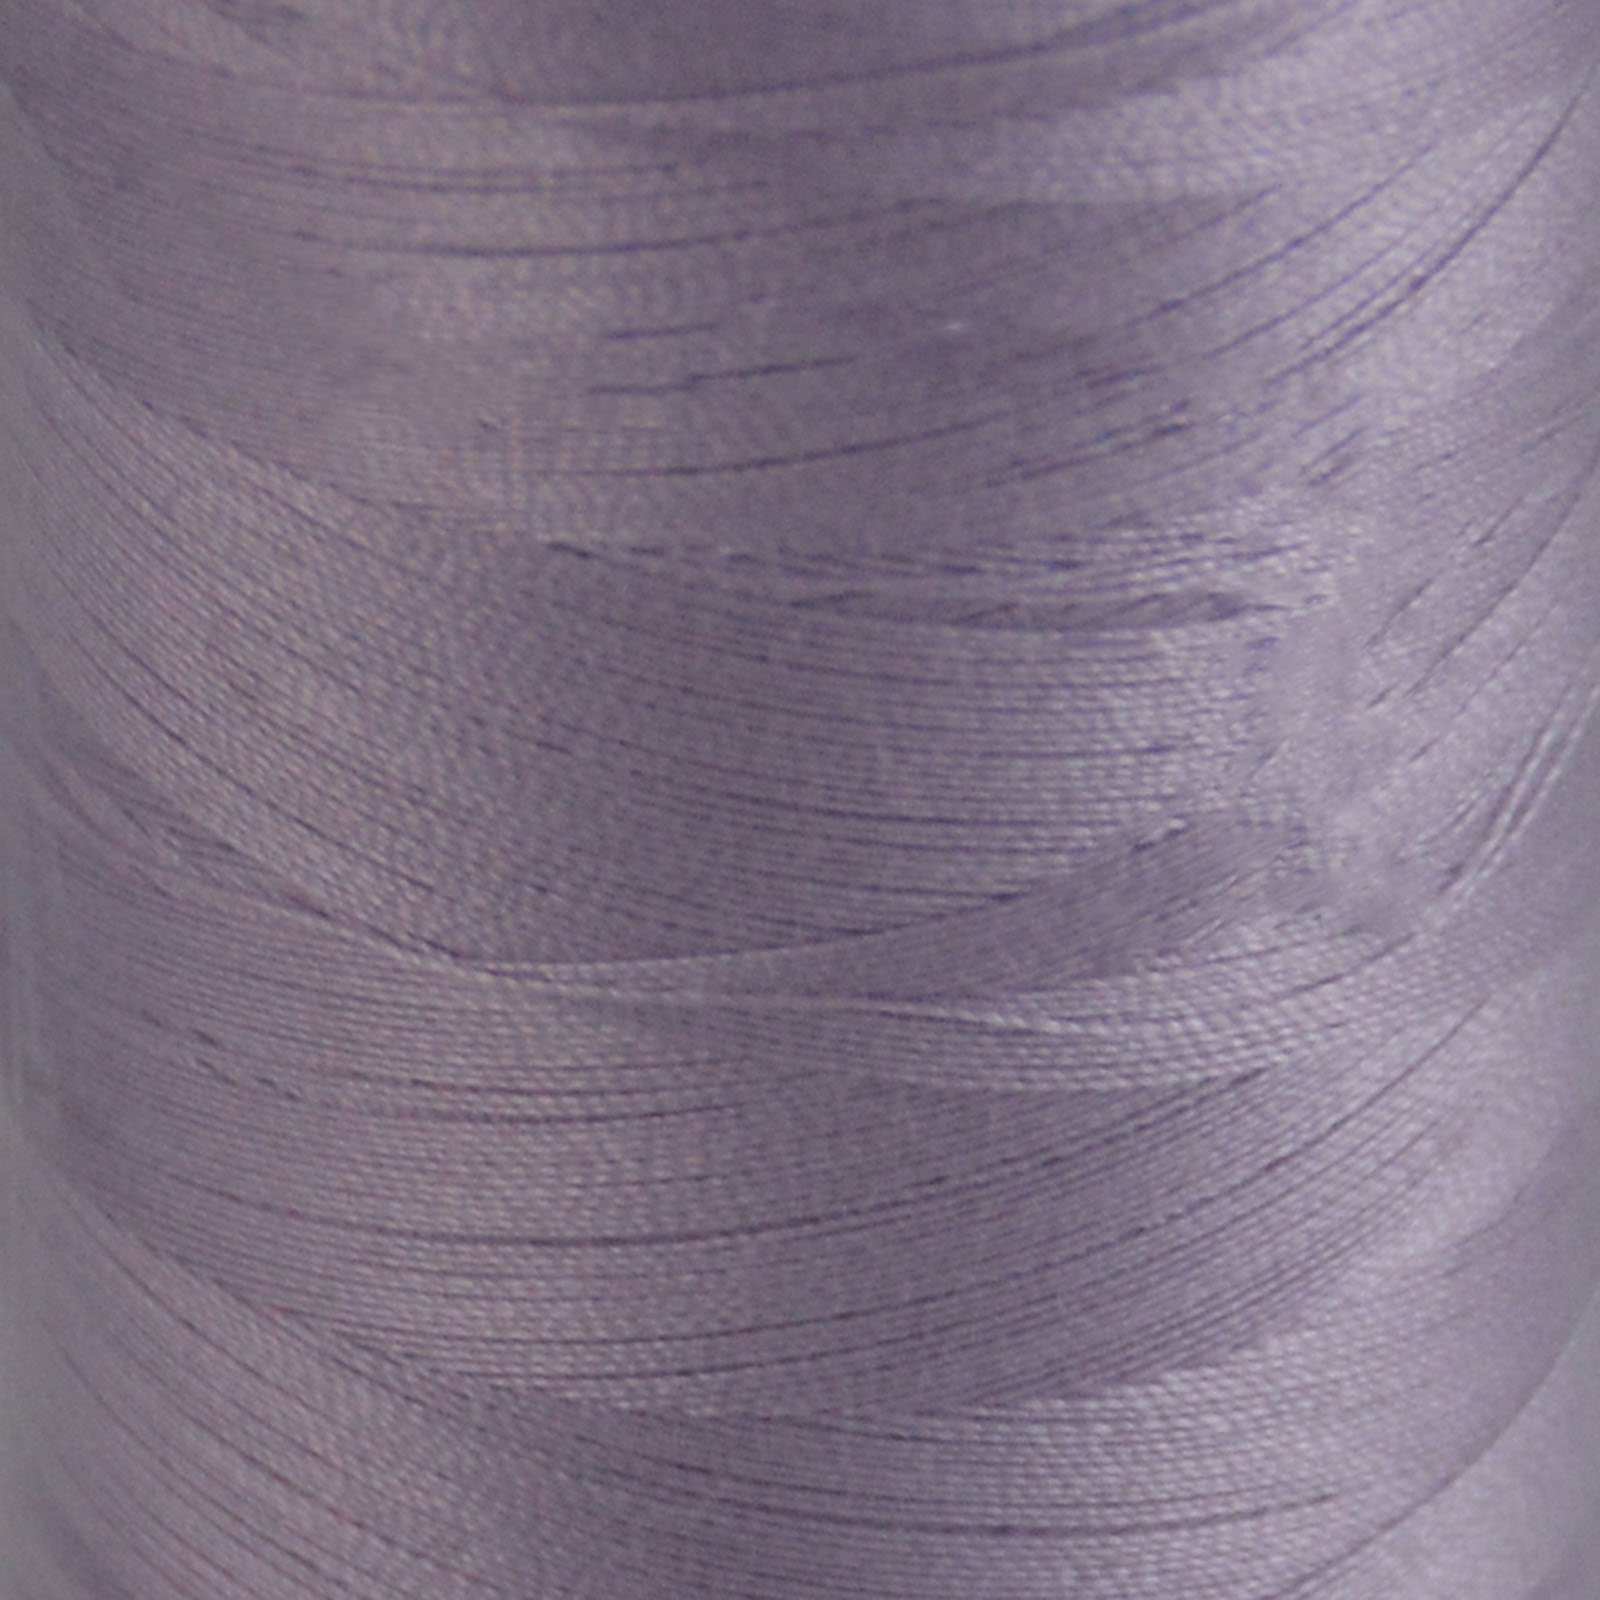 # 2562 Lilac